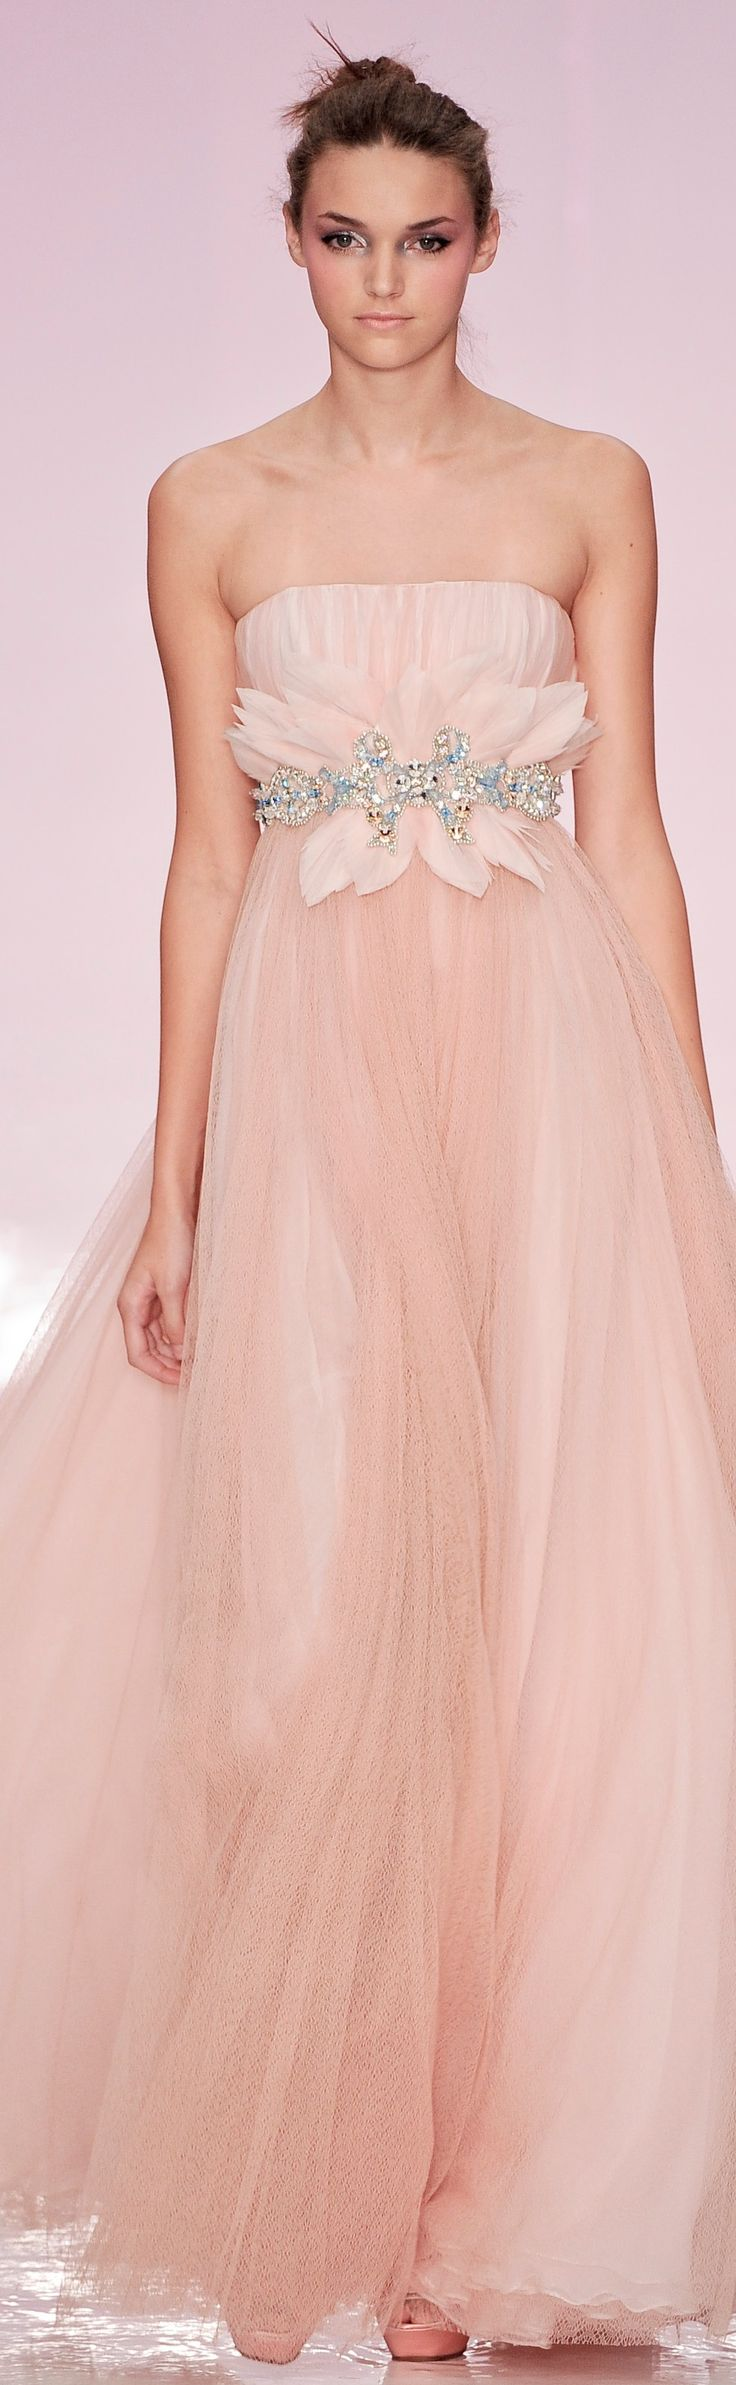 96 best Haute Couture - Jenny Packham images on Pinterest | Jenny ...